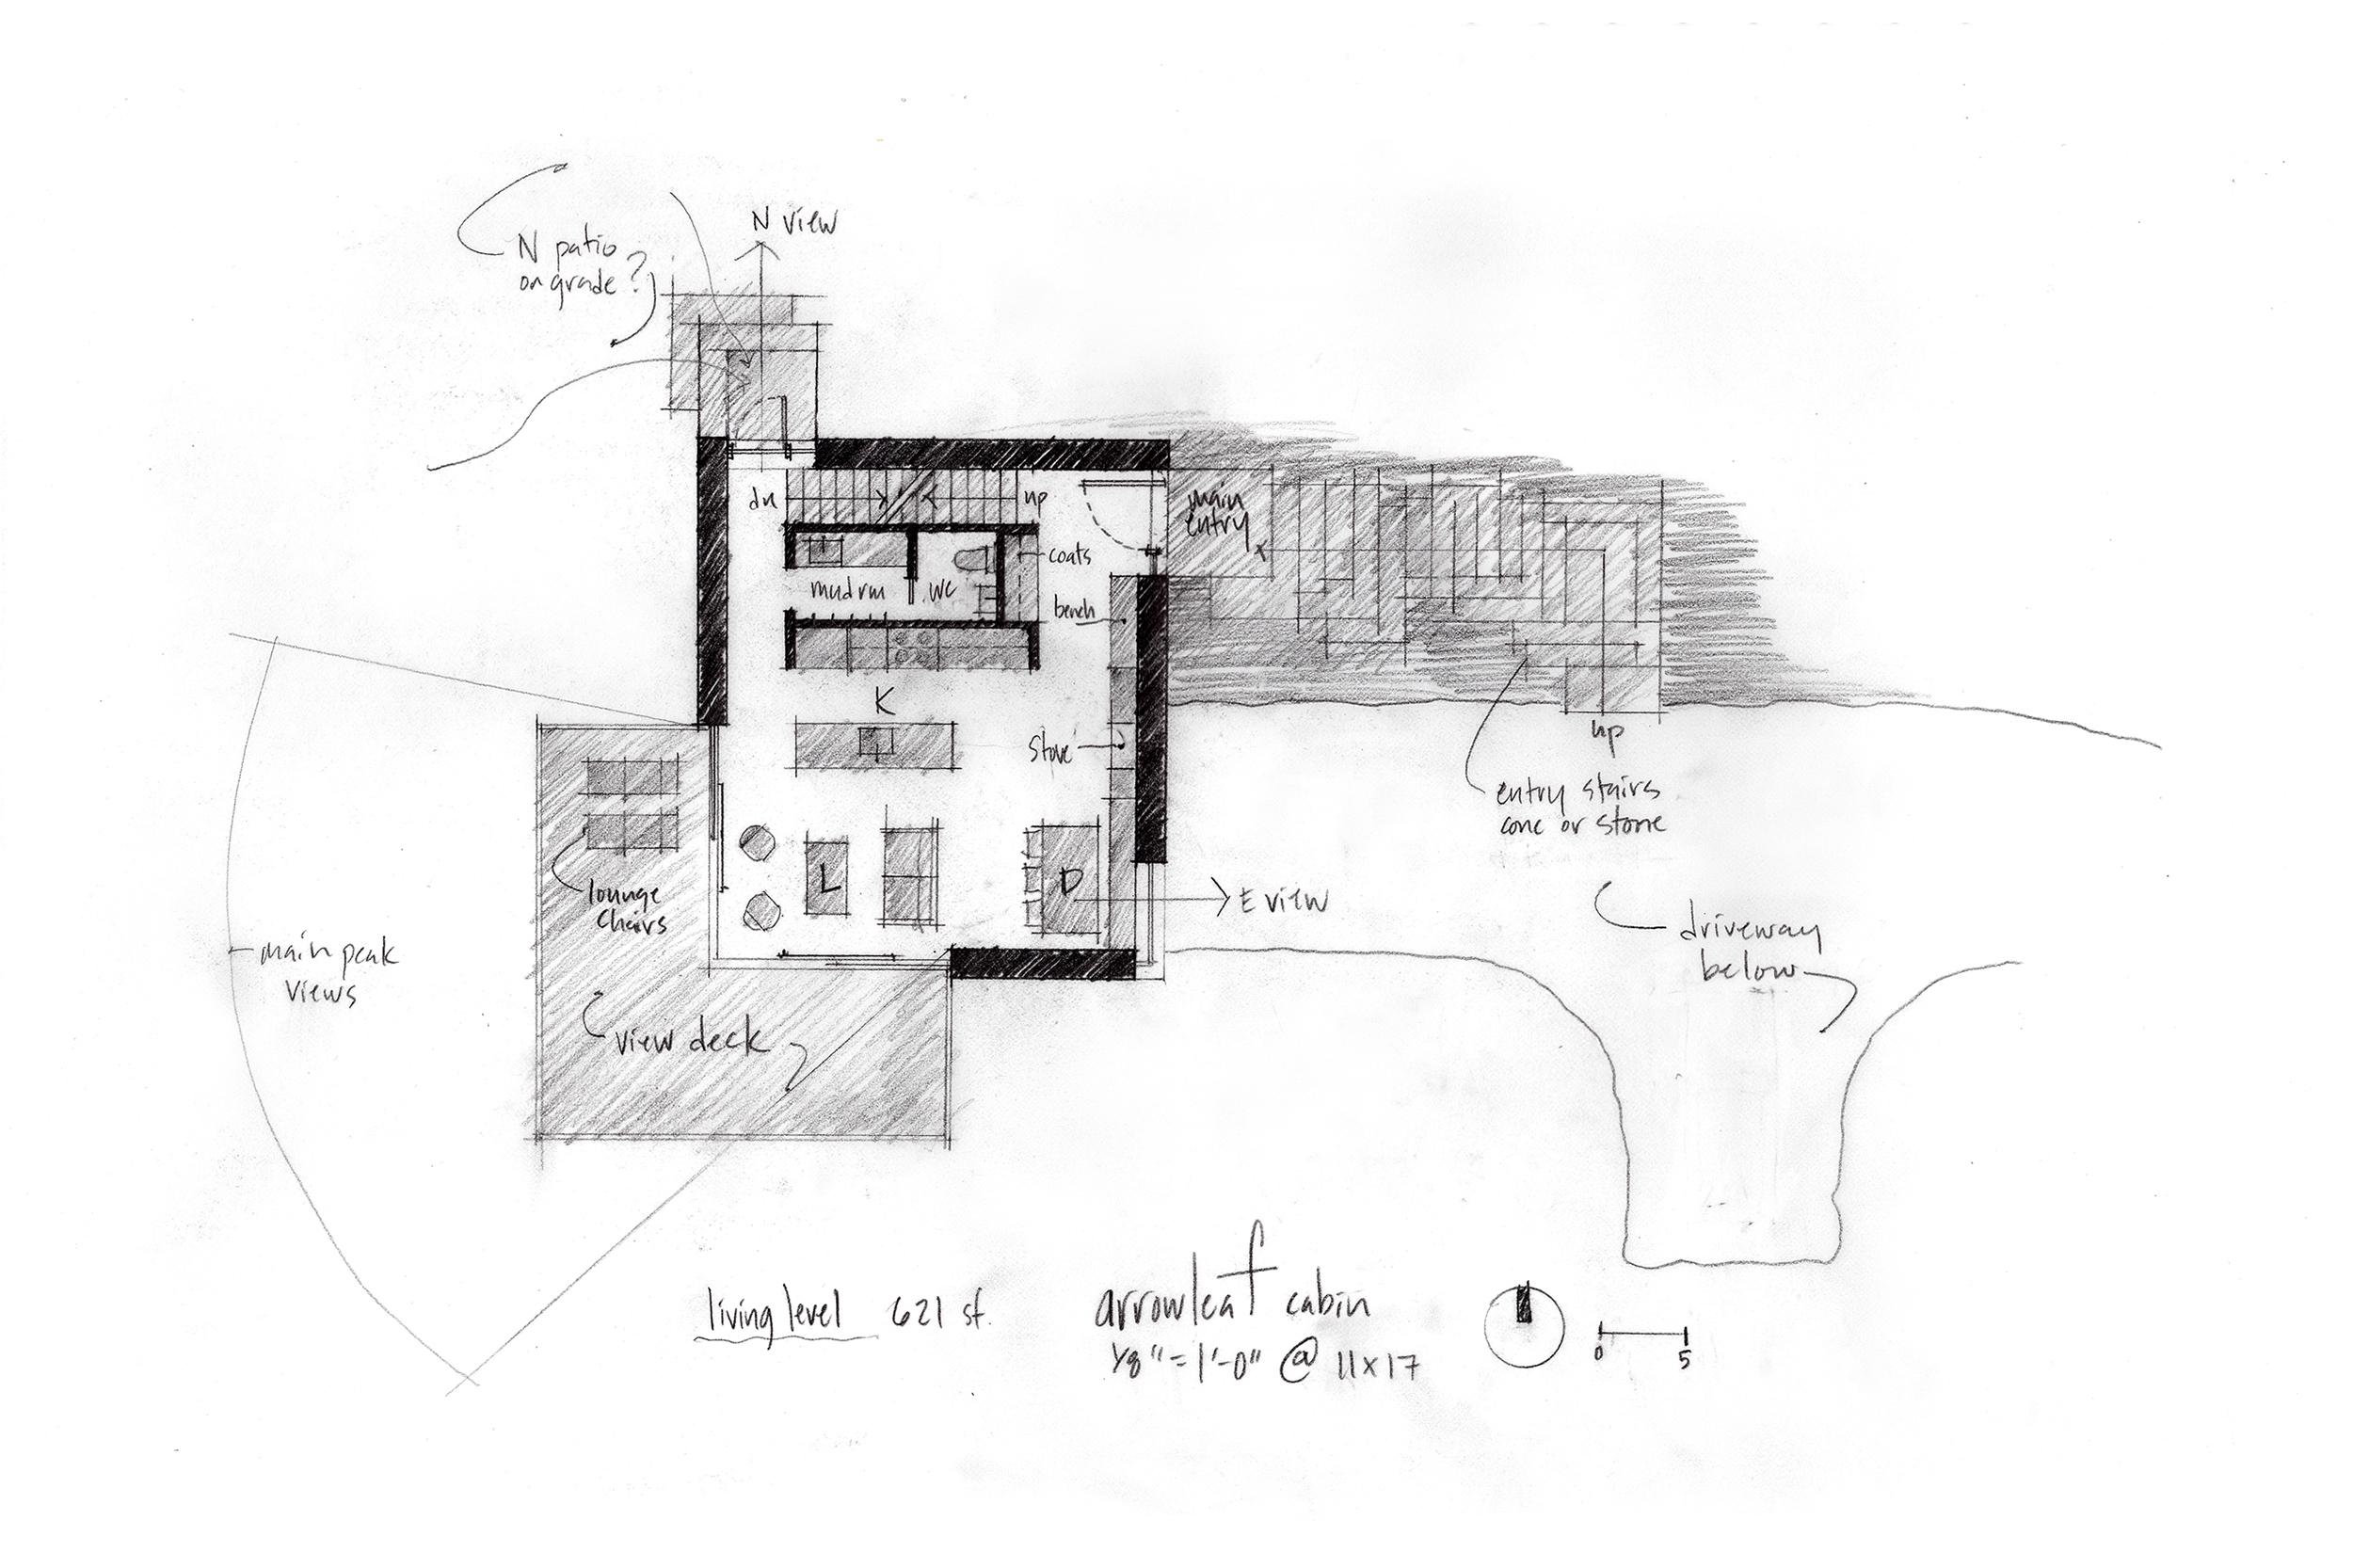 goCstudio_Arrowleaf_living level plan.jpg